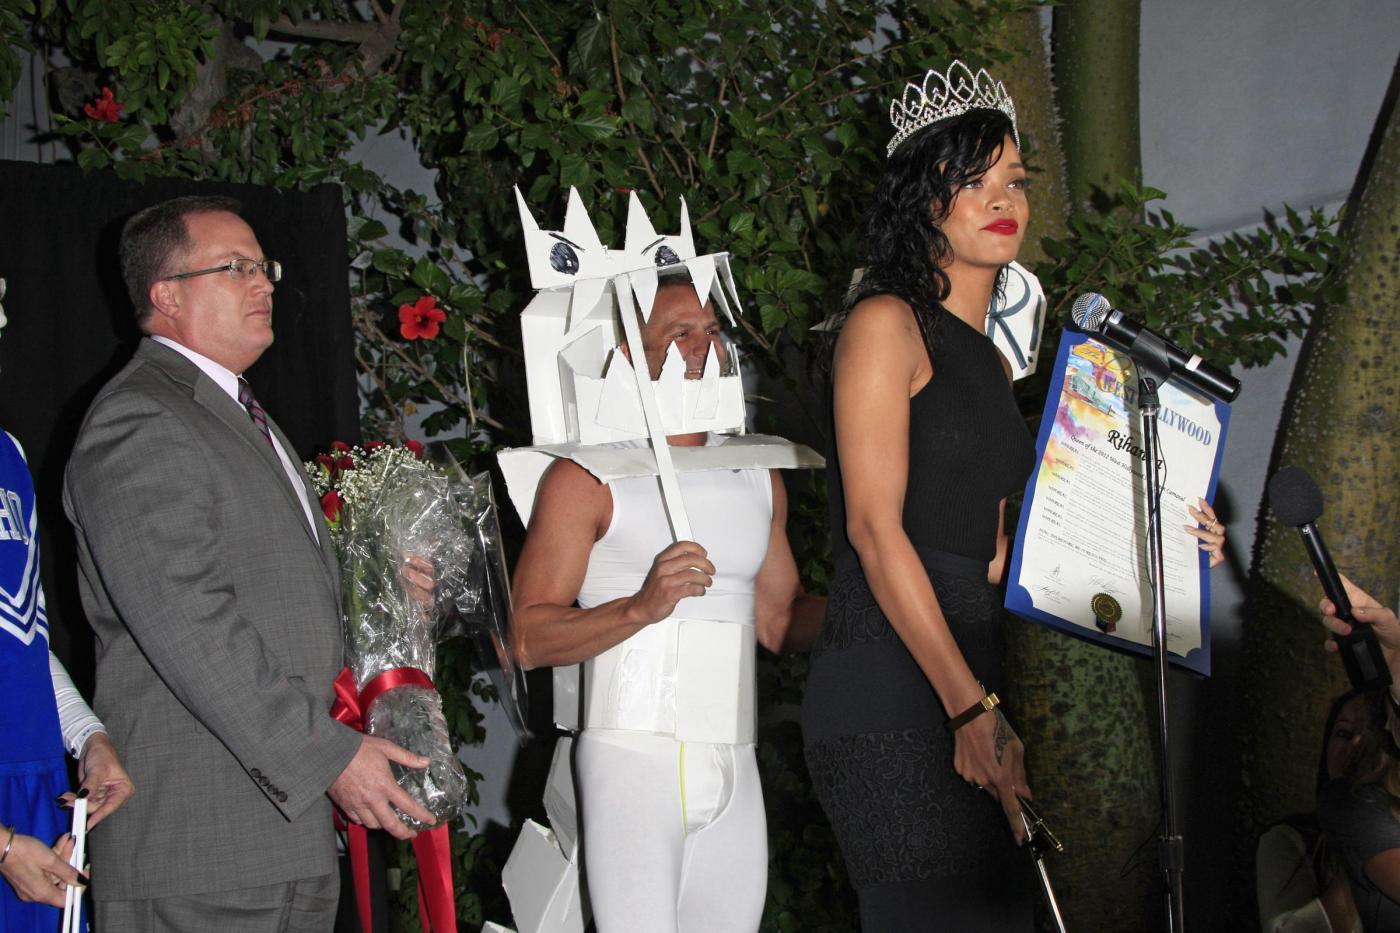 Rihanna incoronata regina di Halloween03